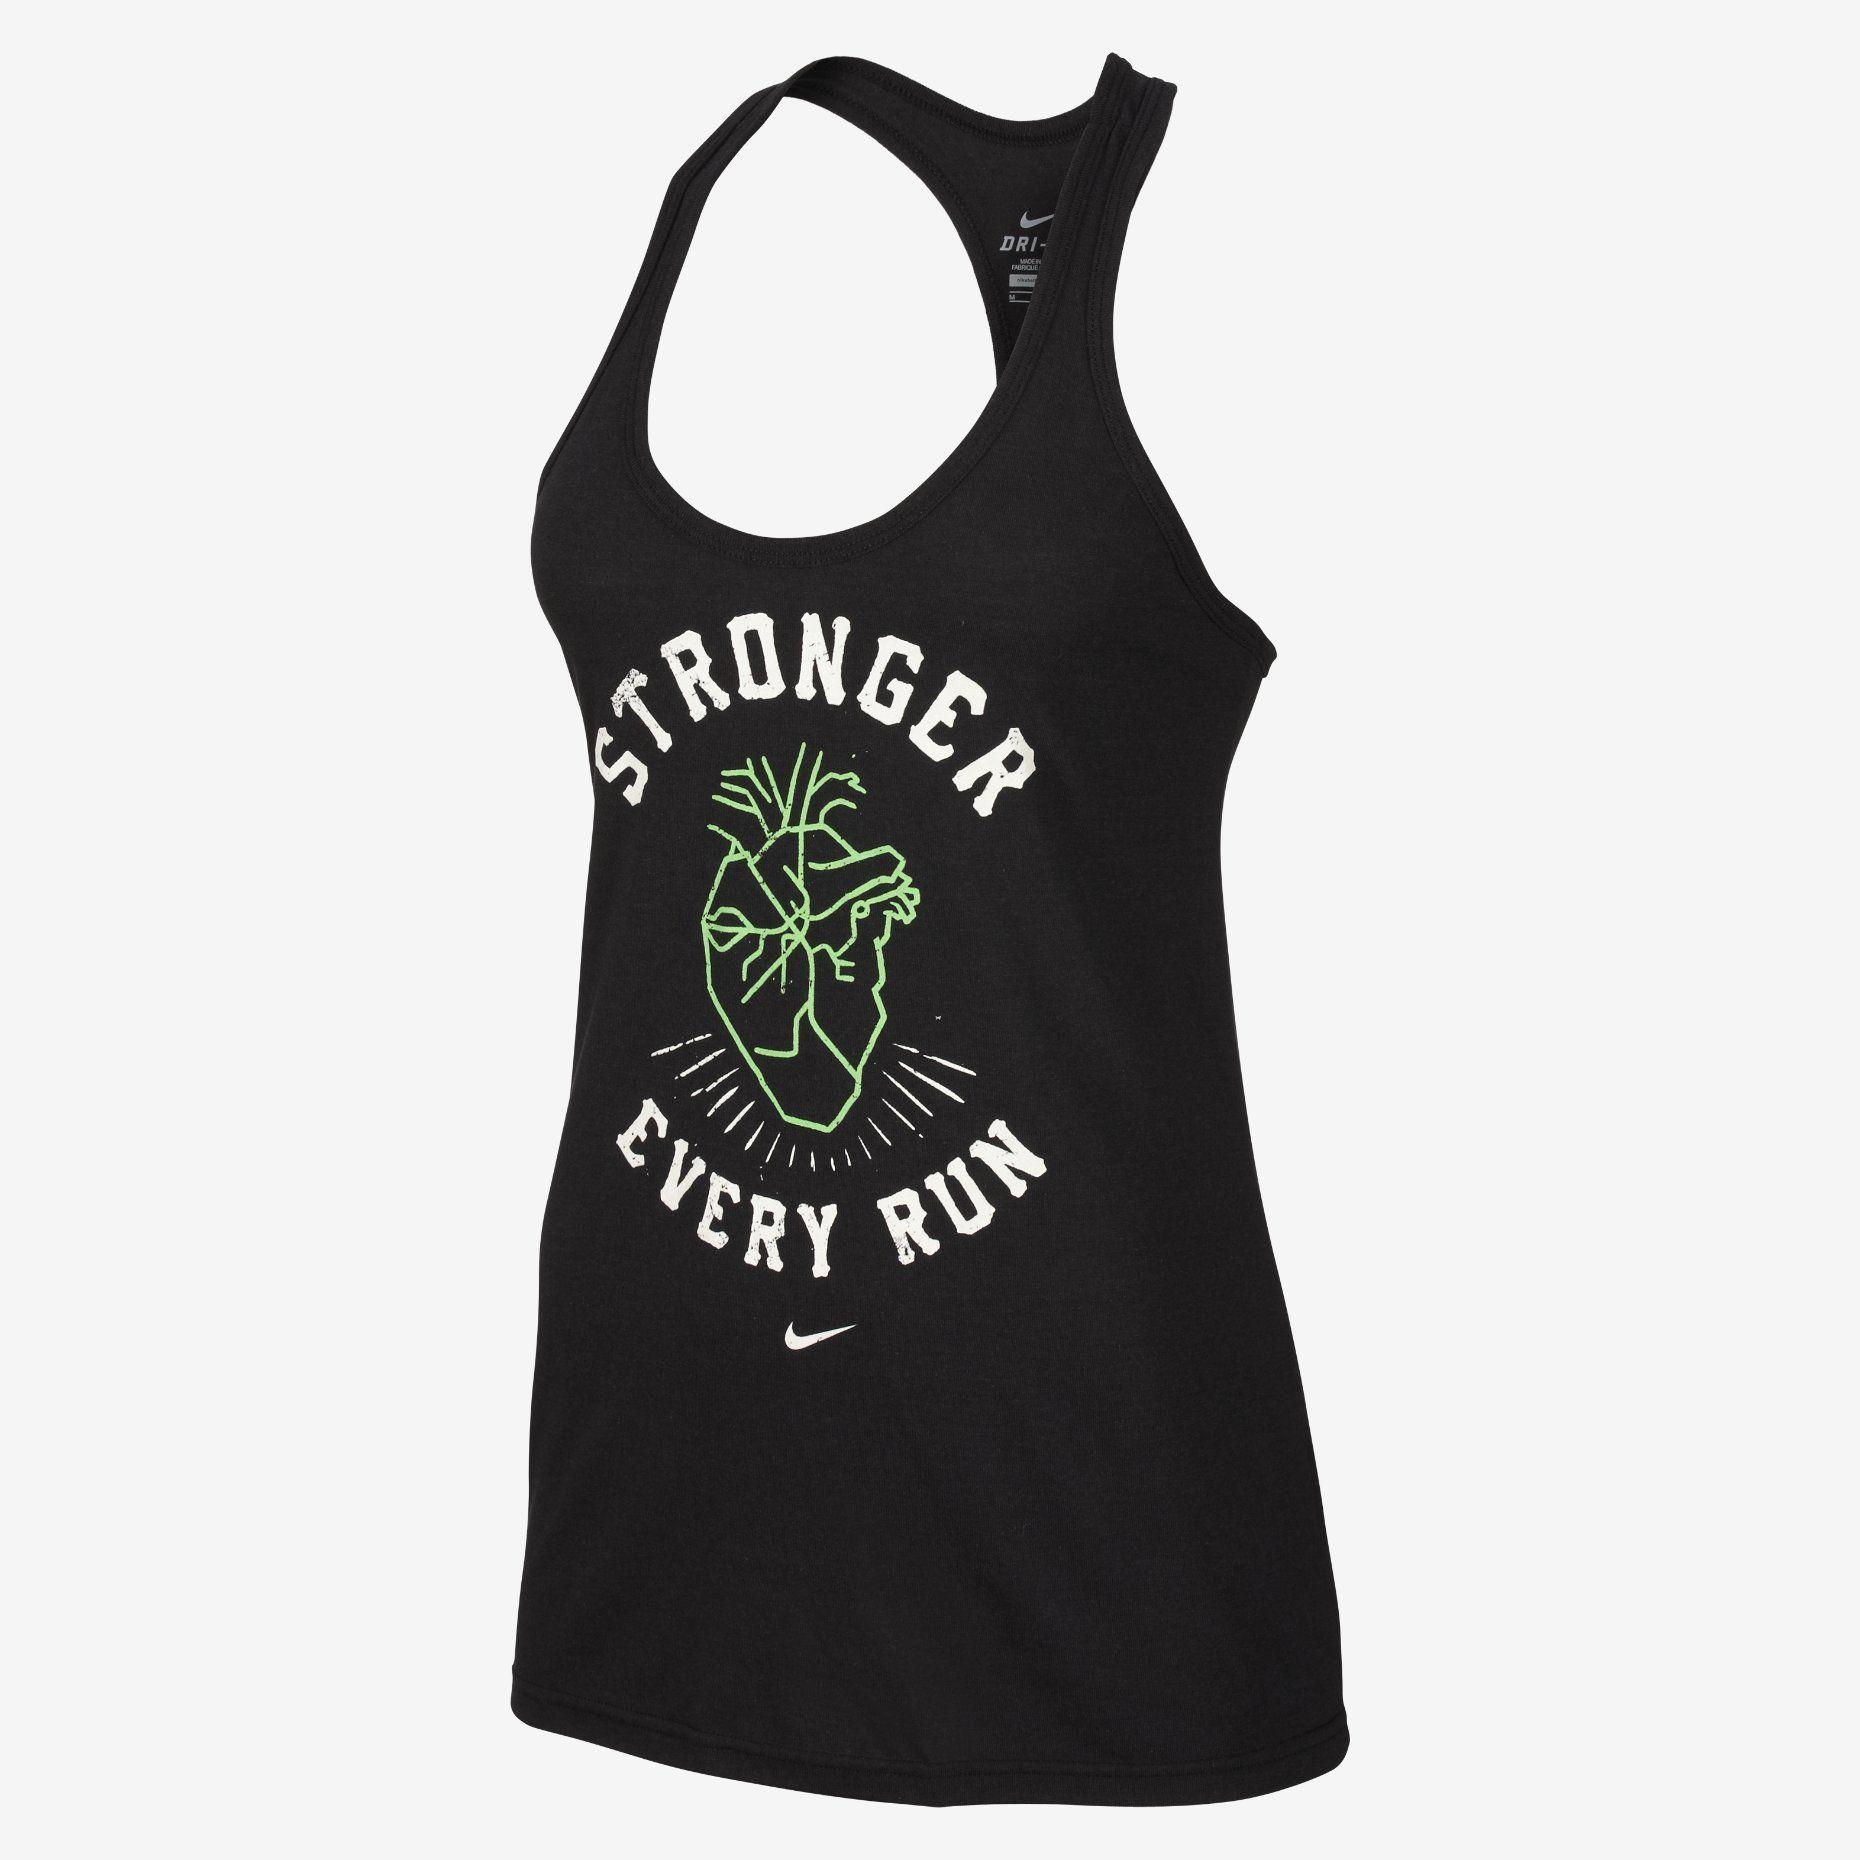 Nike Run Heart (Boston 2014) Women's Tank Top. Nike Store